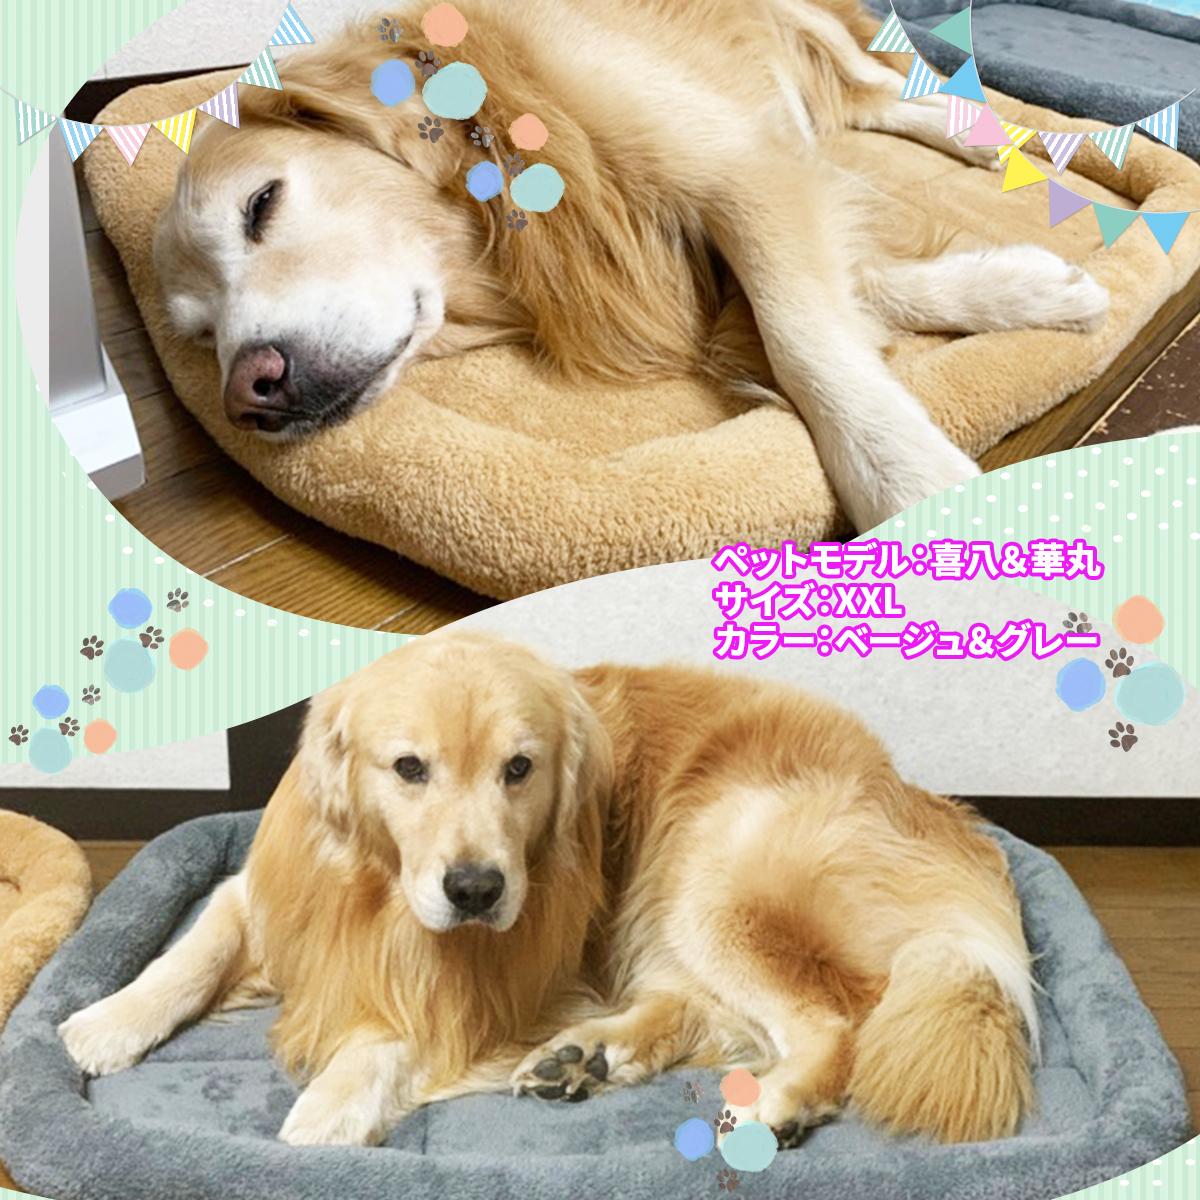 PetStyle シンプル ペット用ベッド・マット 中型 大型 犬 猫 XXLサイズ